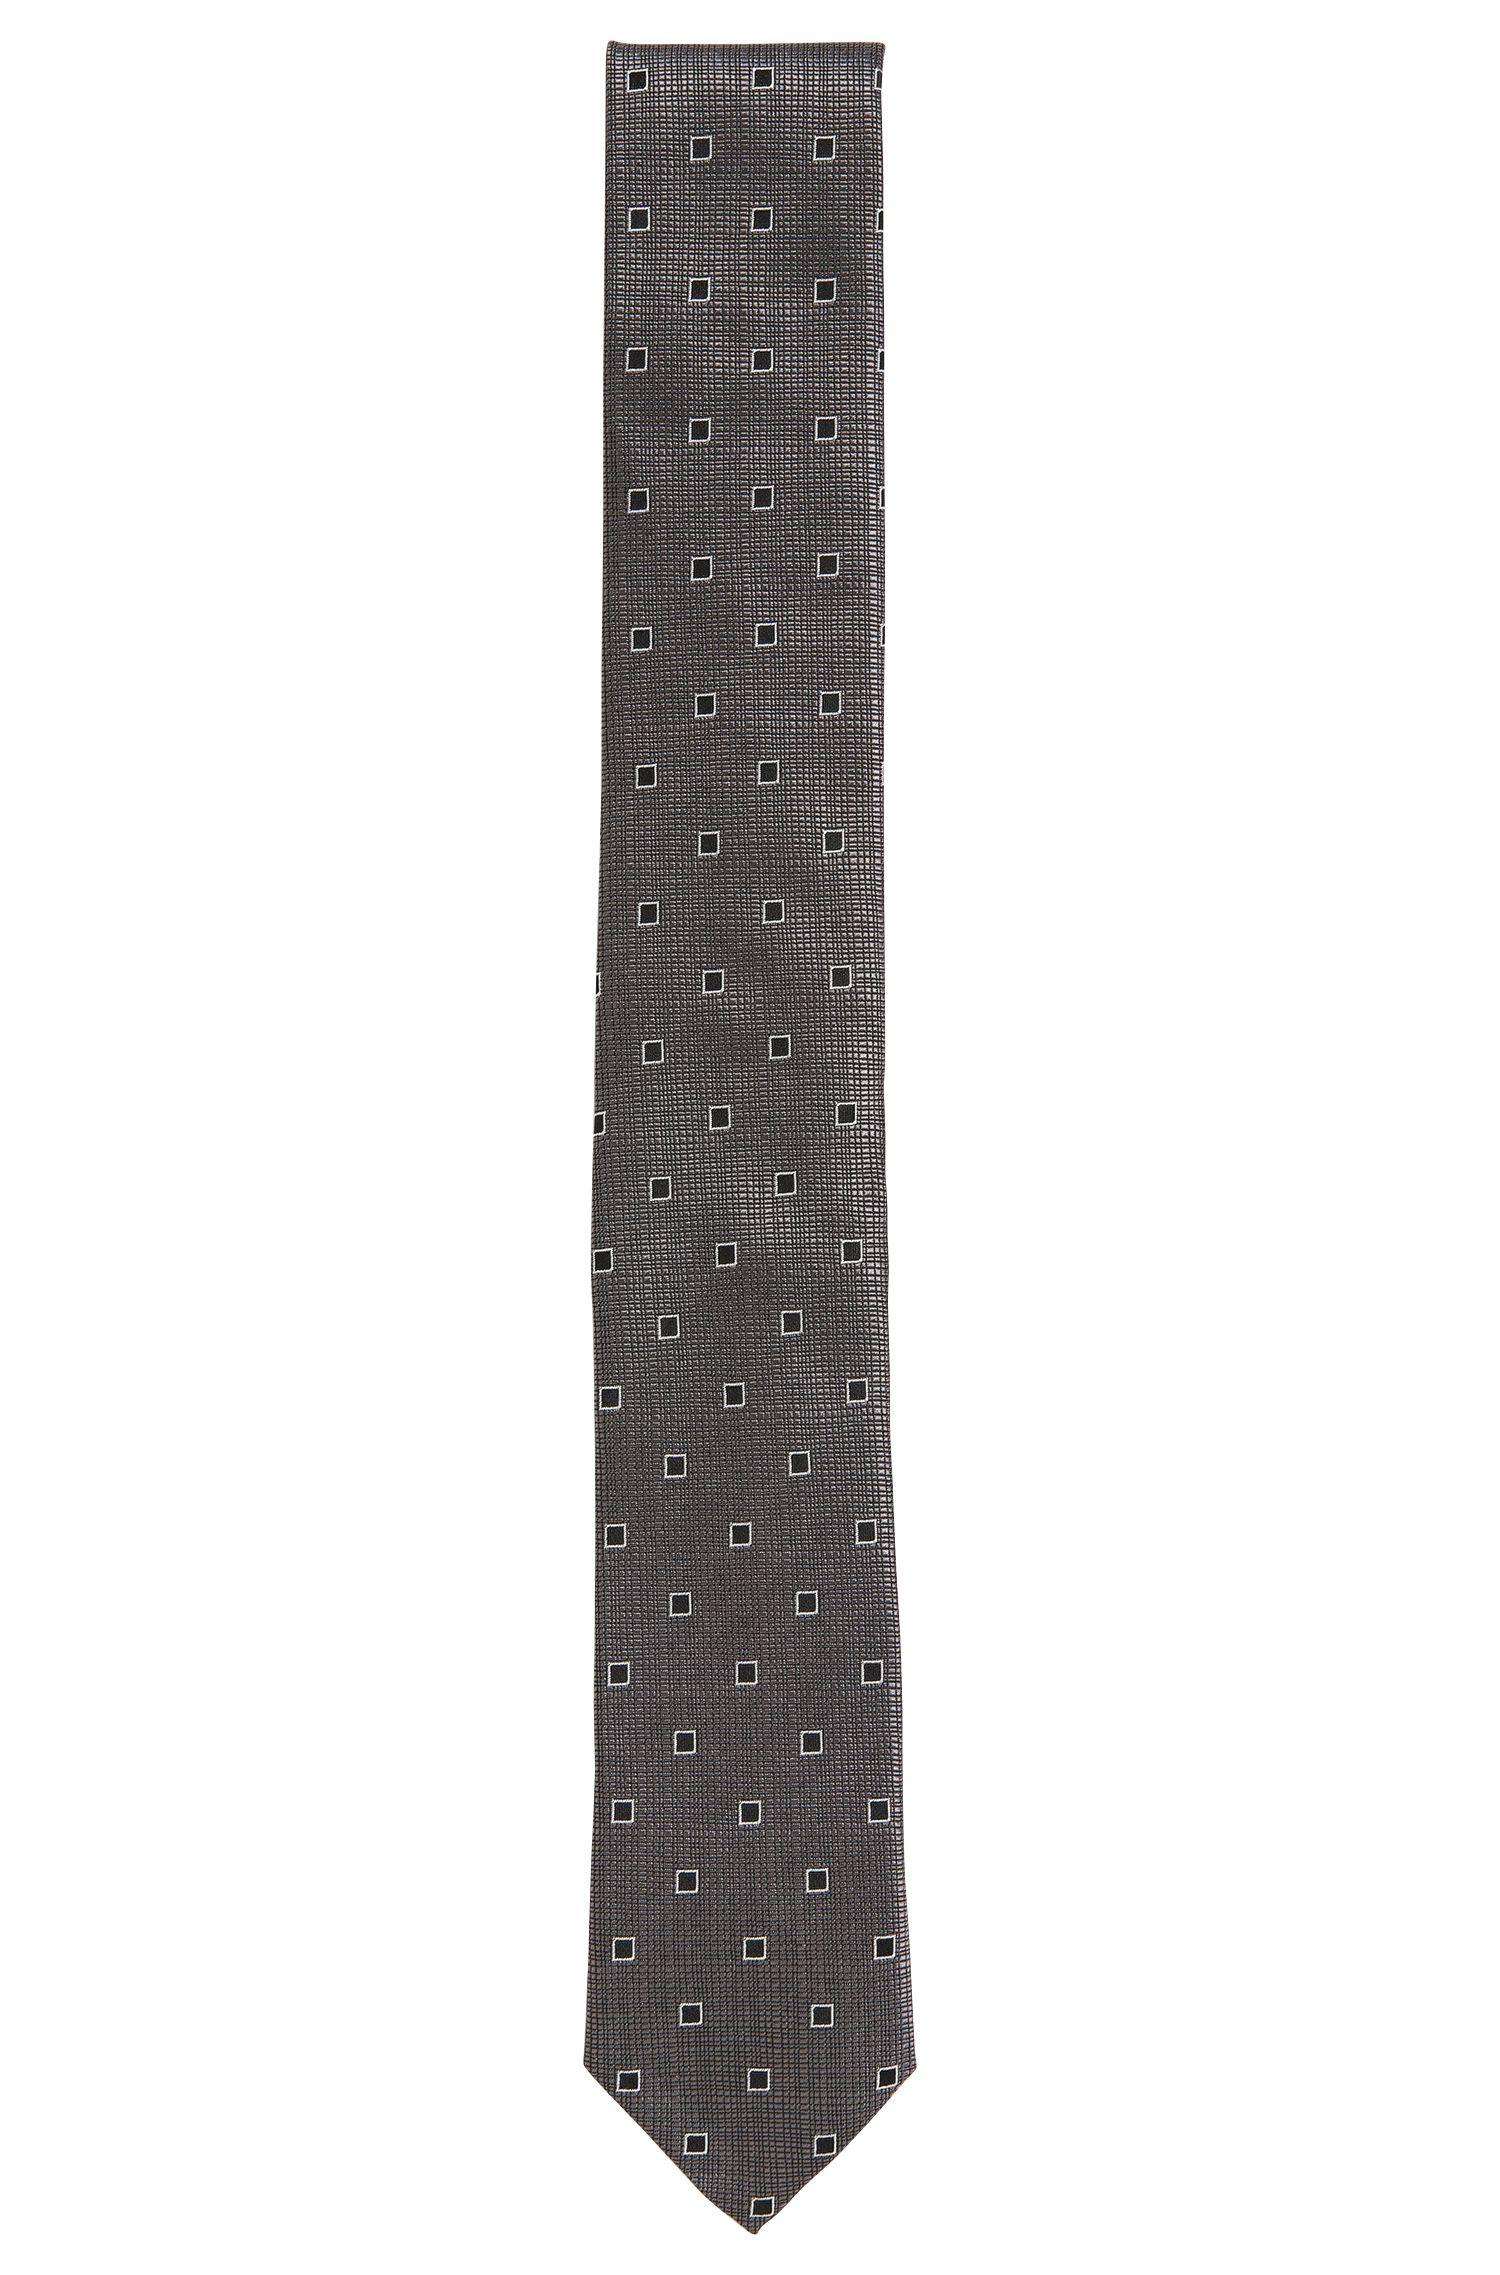 'Tie 6 cm' | Slim, Italian Silk Patterned Tie